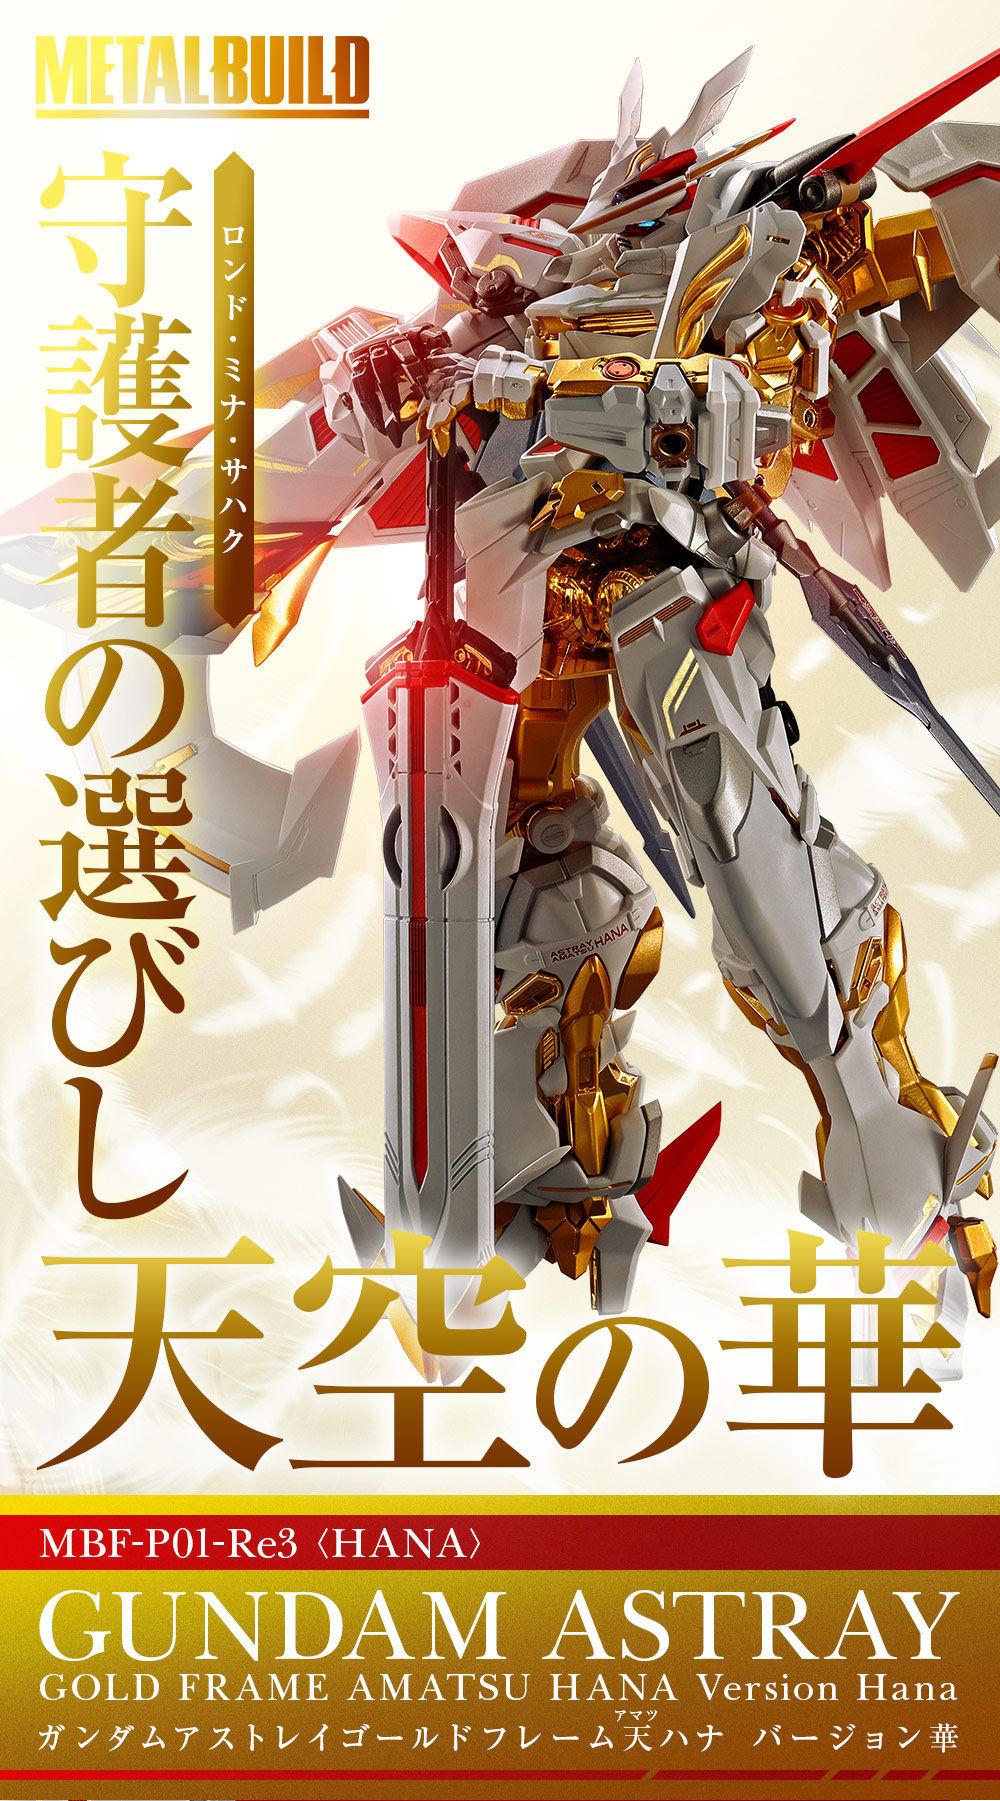 METAL BUILD ガンダムアストレイ ゴールドフレーム天ハナ バージョン華01